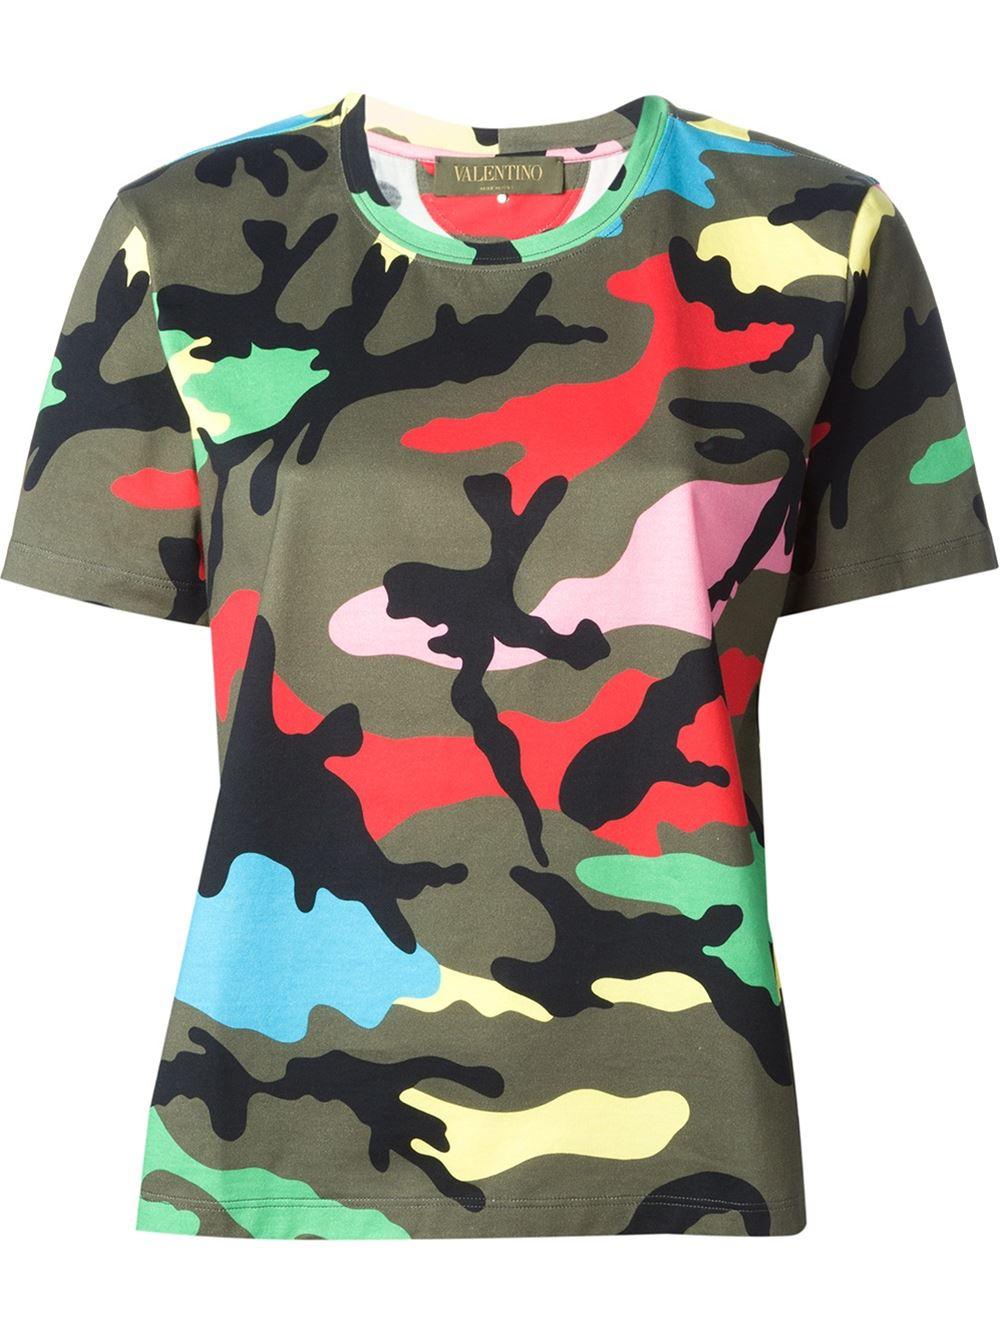 Discount Explore Free Shipping Popular Cotton shirt Valentino Sale 2018 tP7CFlOYev